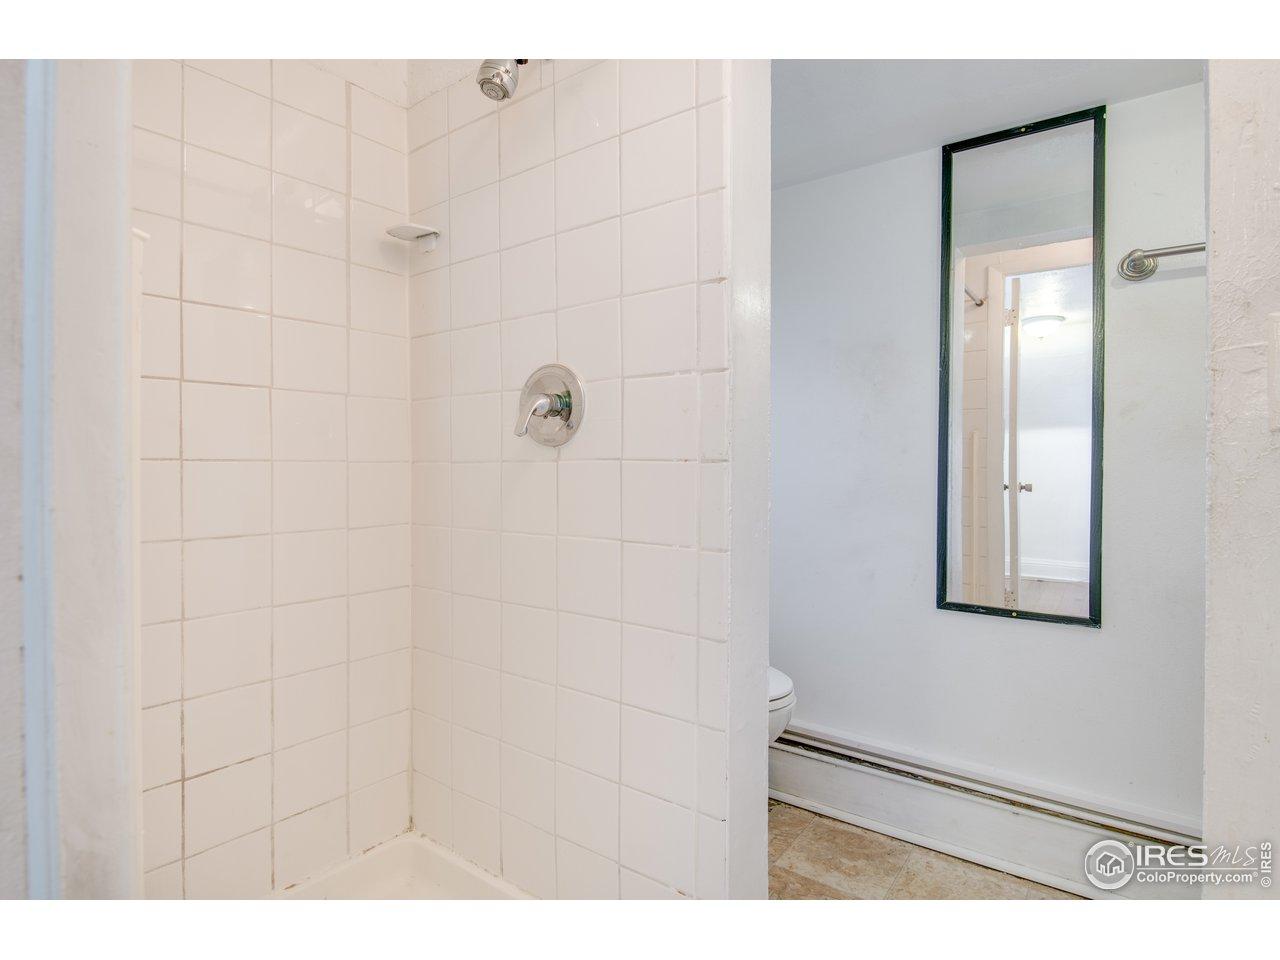 Unit 1 3/4 Bath